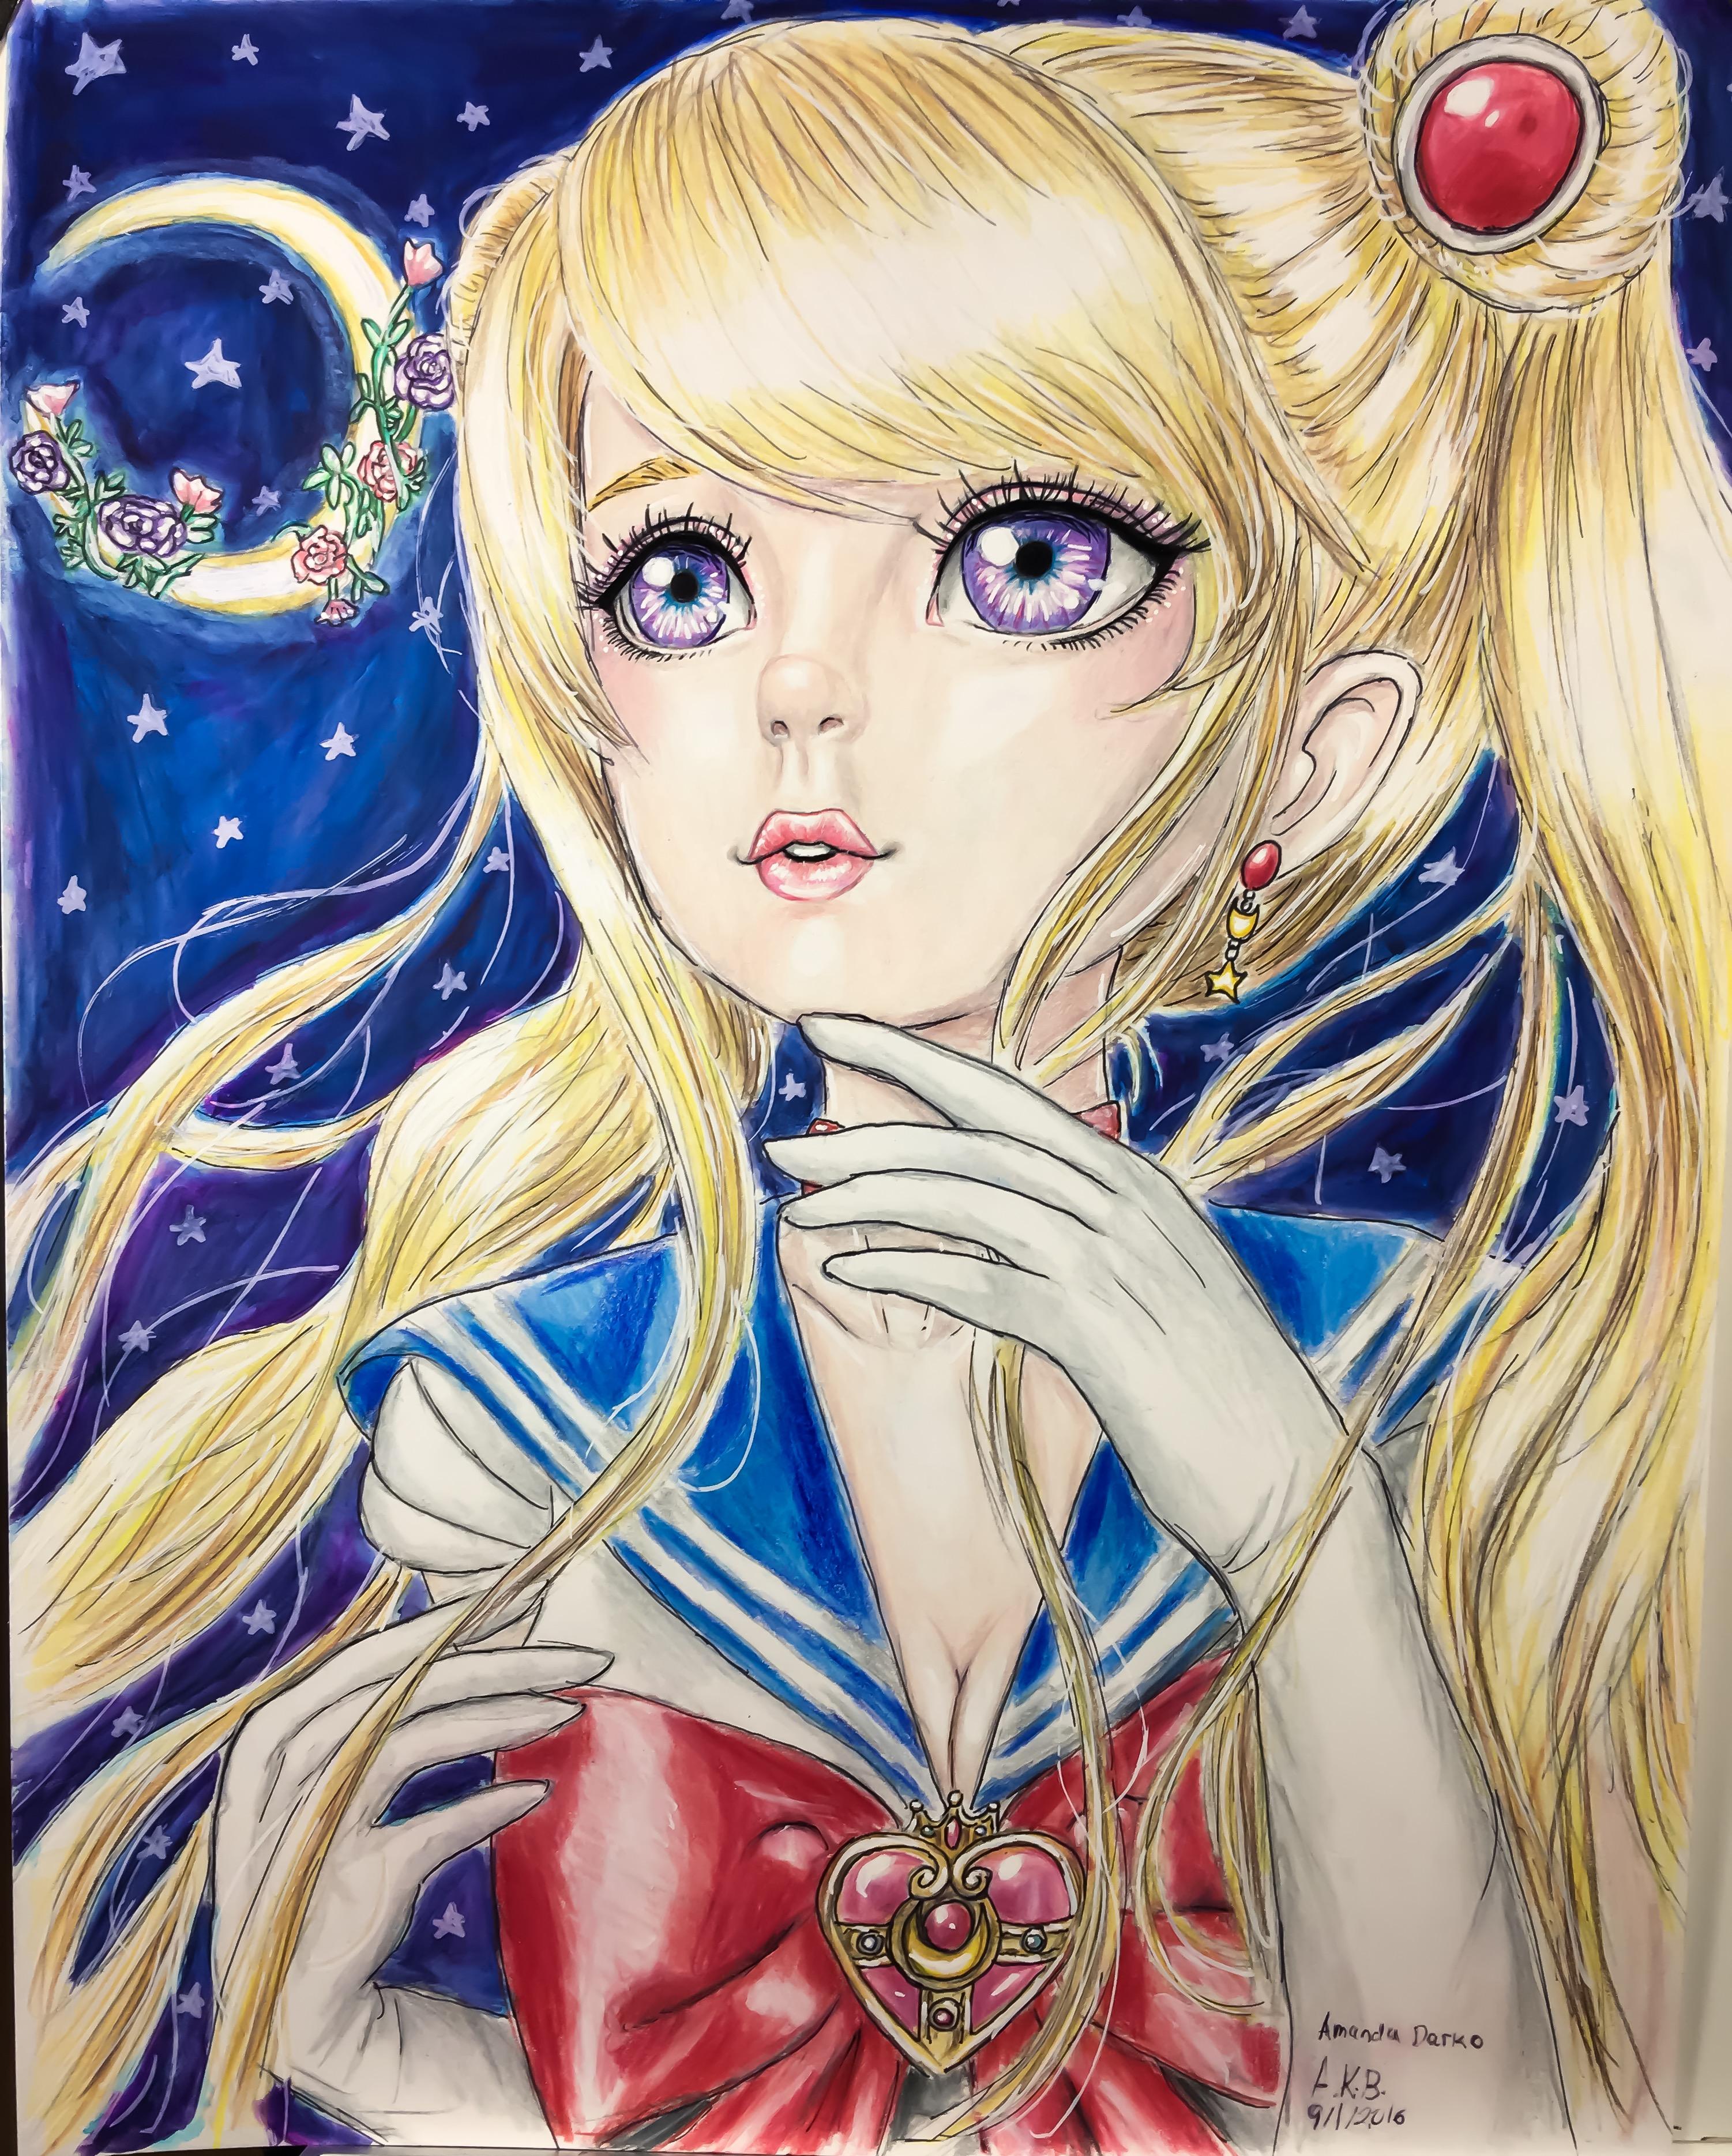 Sailor moon: fighting evil by moonlight